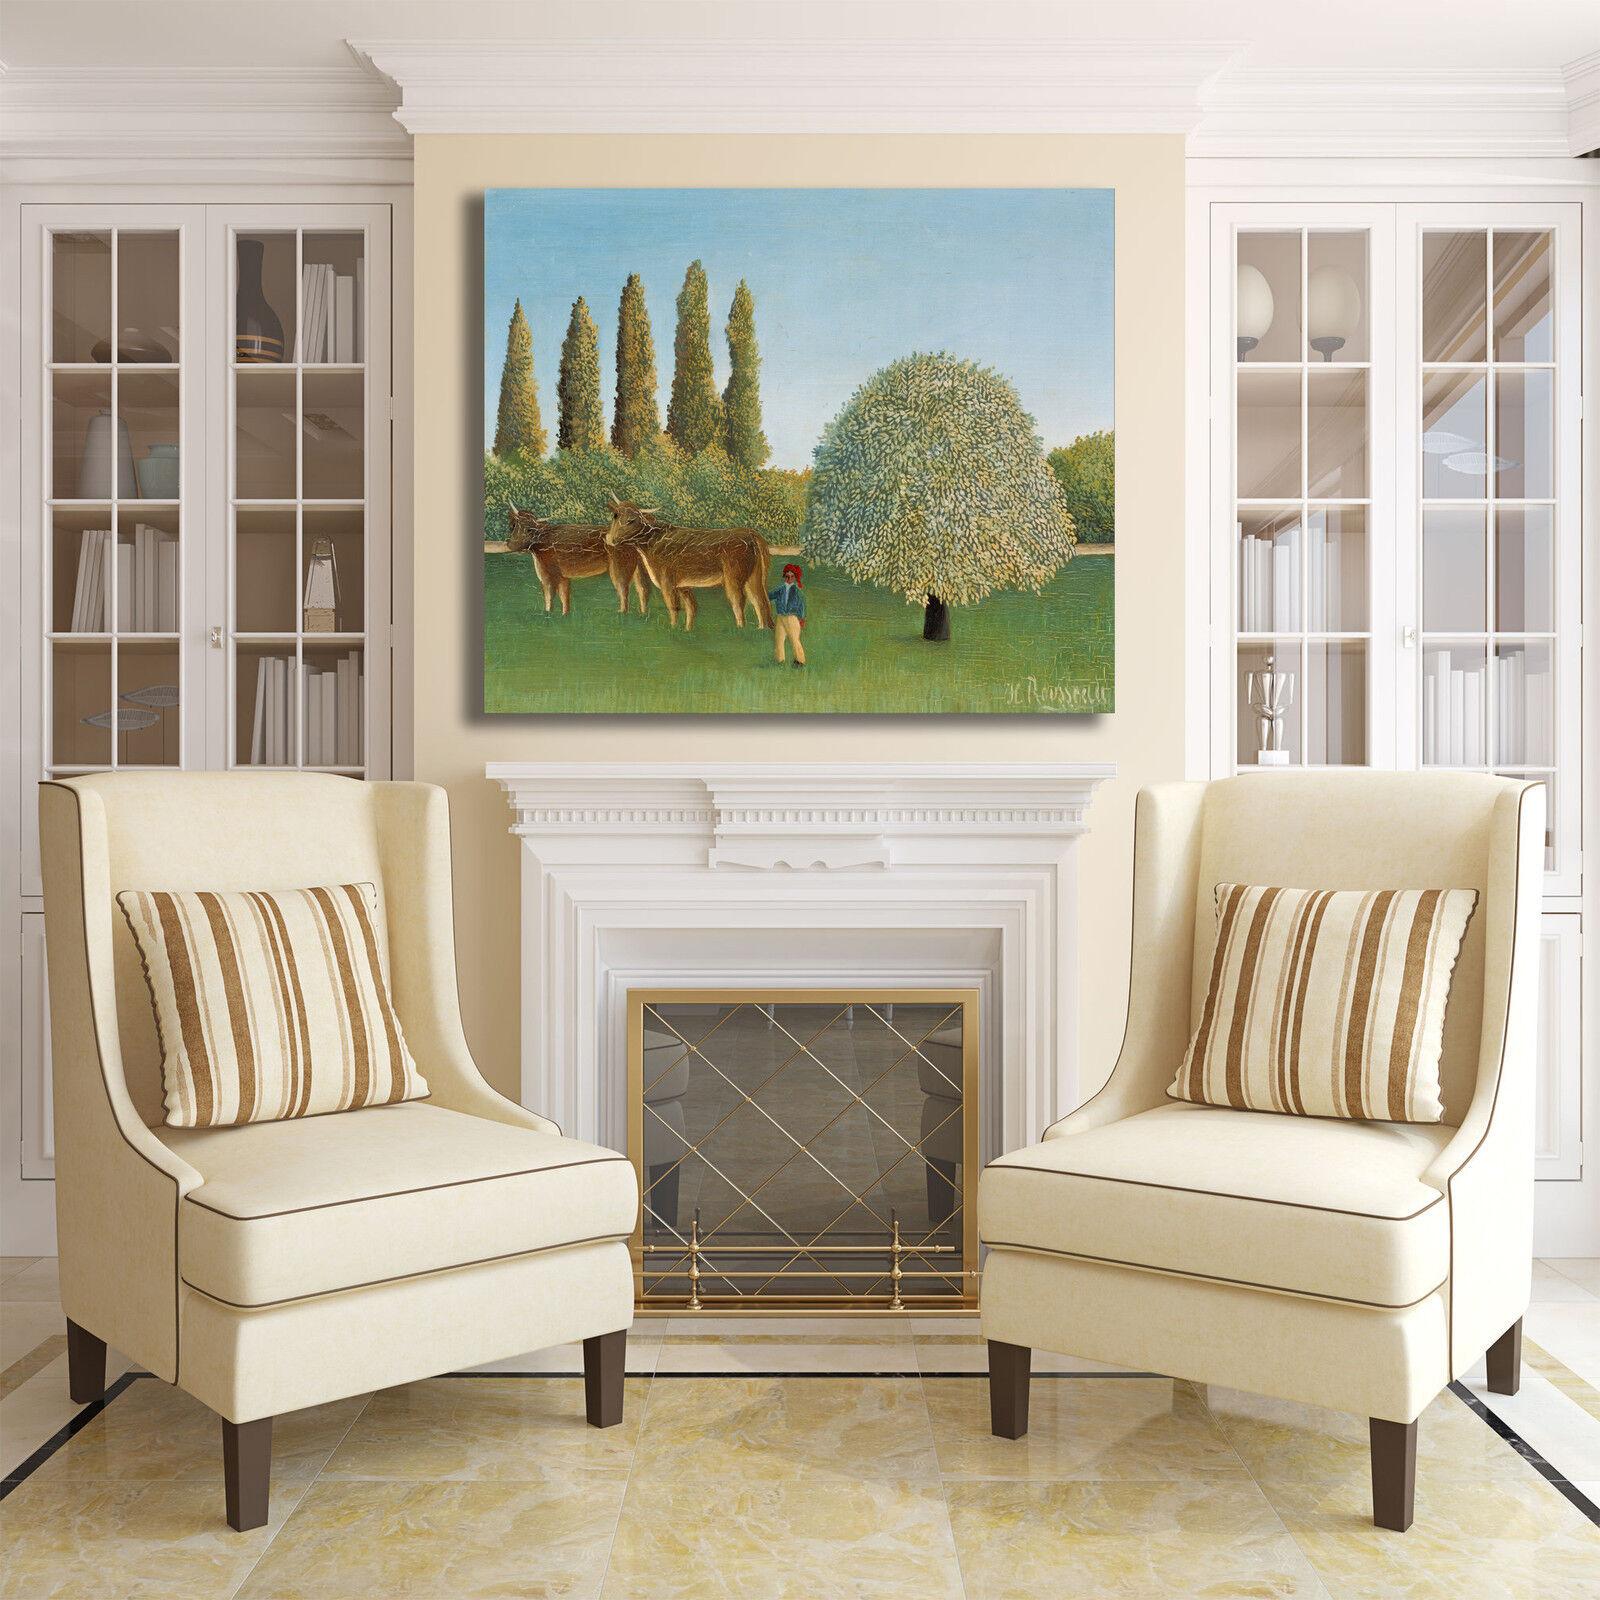 Rousseau Rousseau Rousseau prato design quadro stampa tela dipinto telaio arrossoo casa 5b2c7a